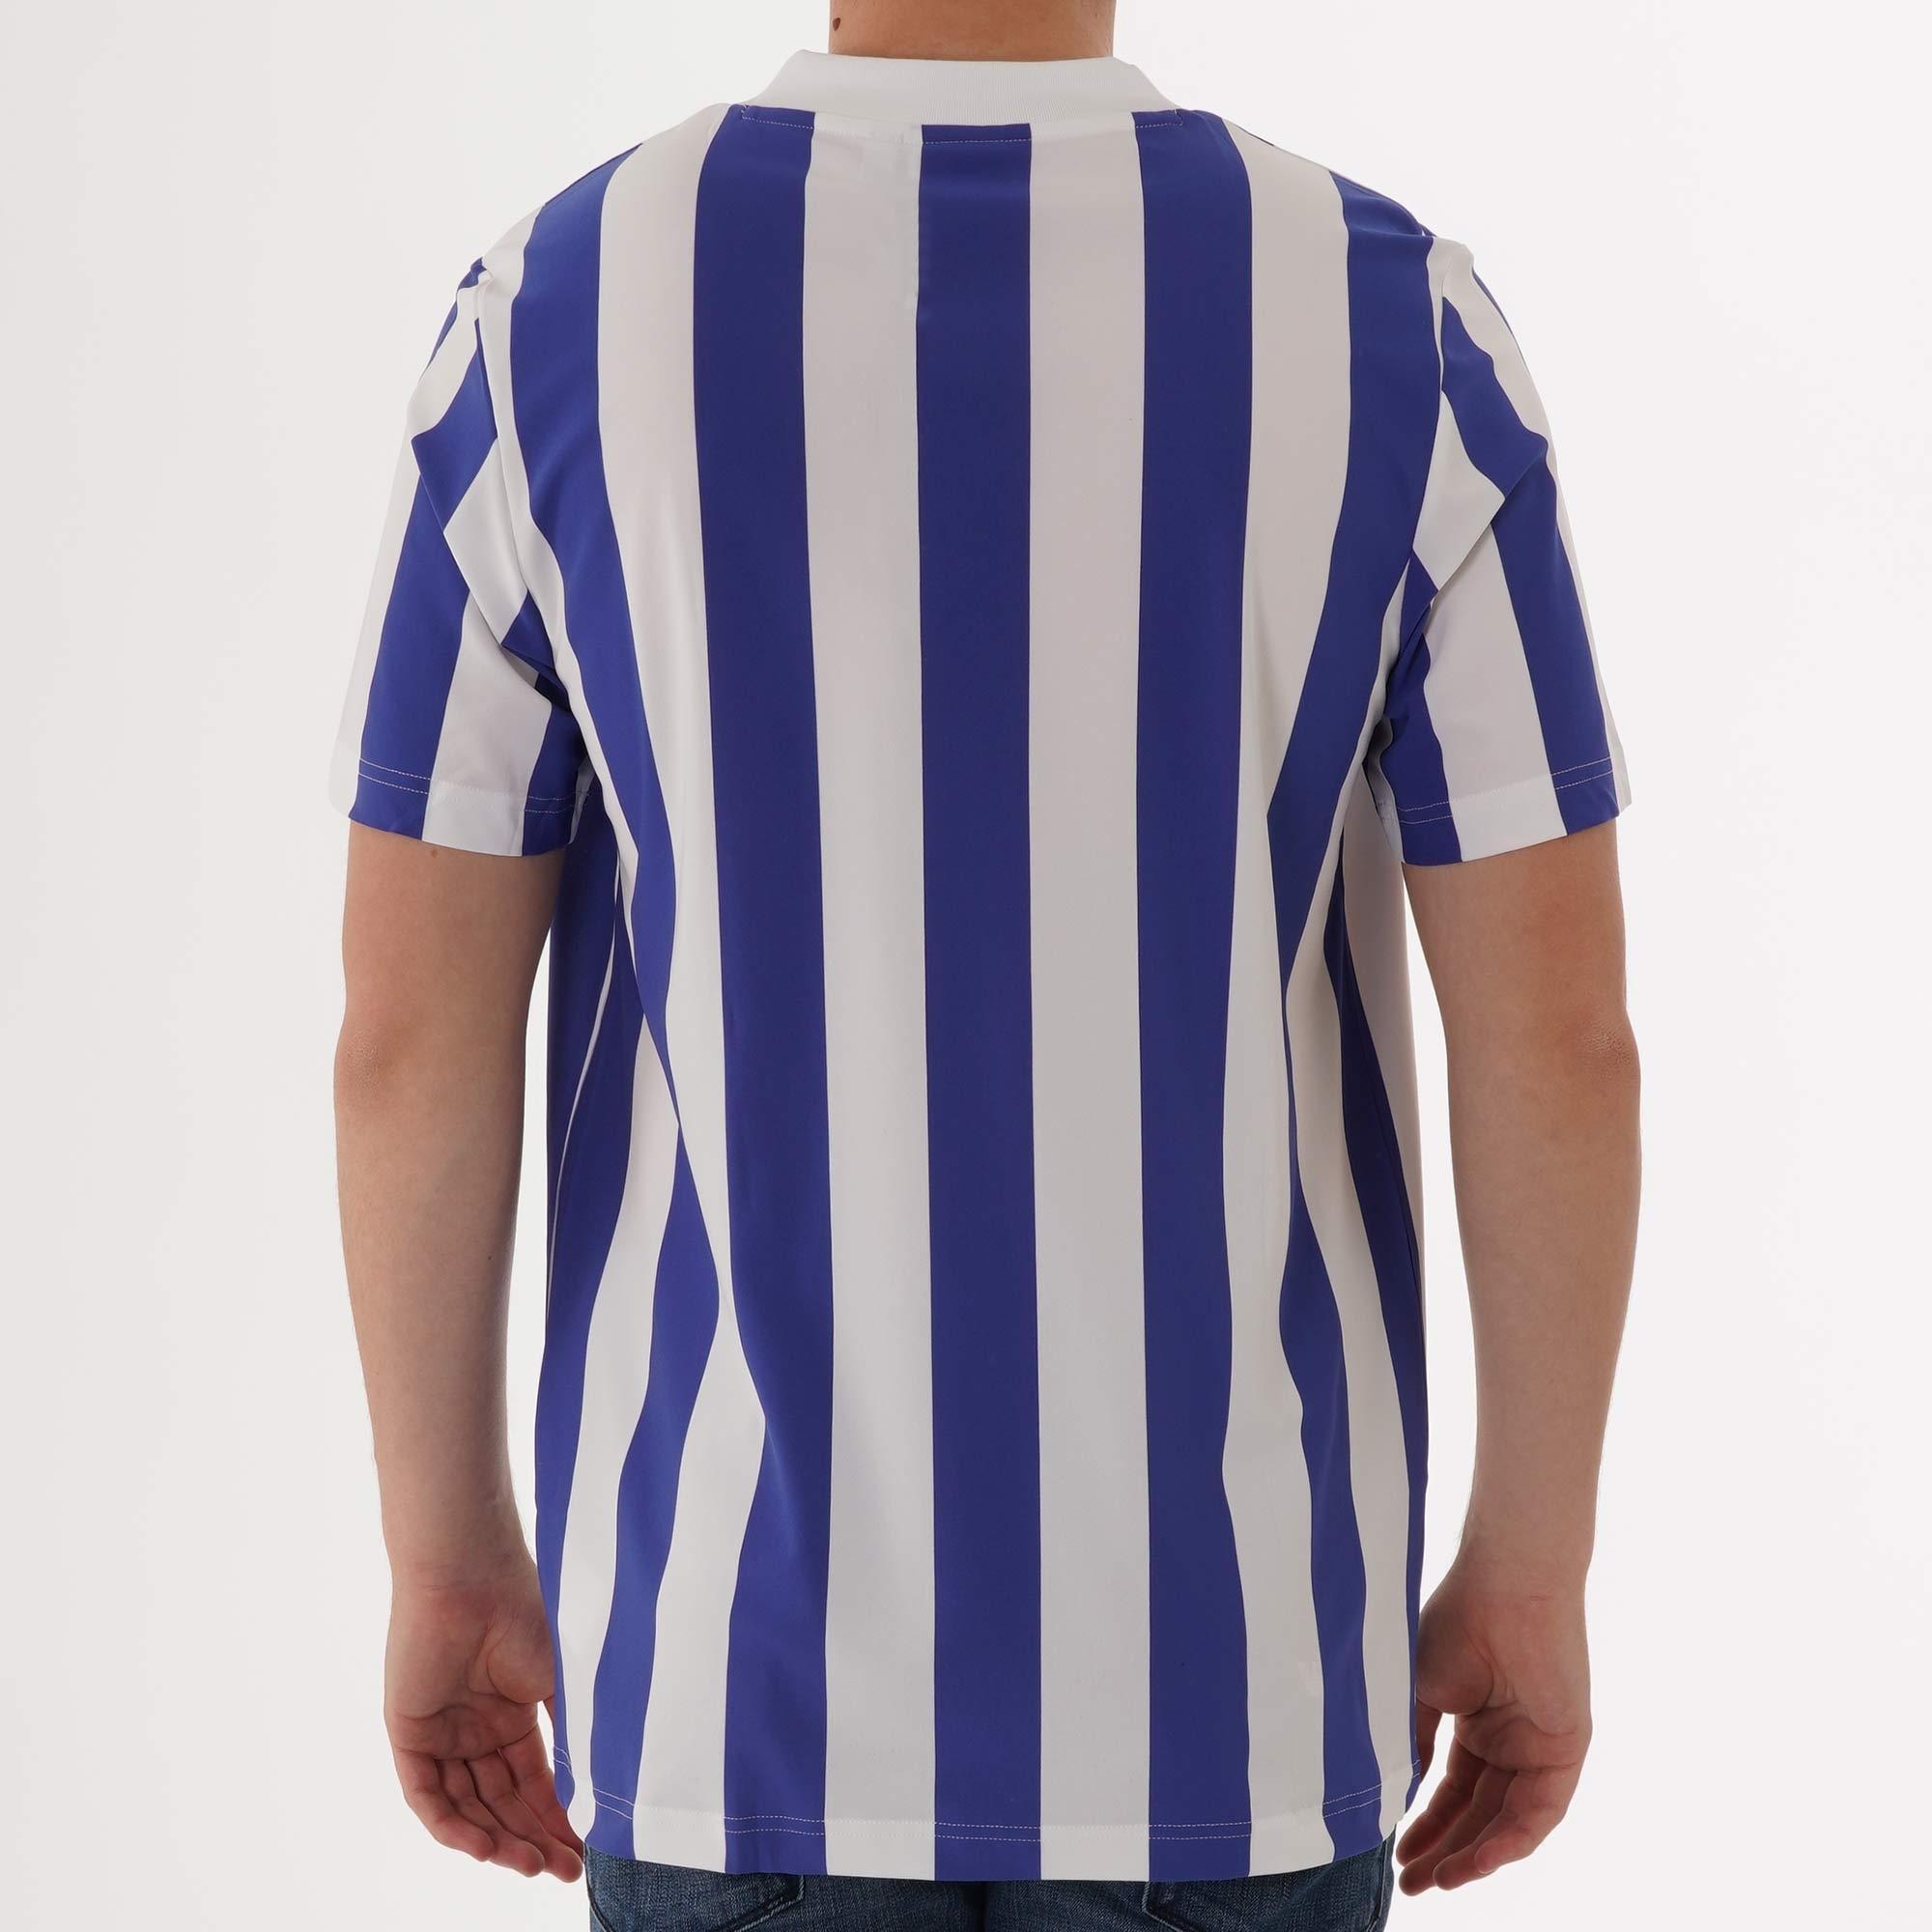 Adidas Originals Stripes Jersey T-Shirt - Active Blue & White